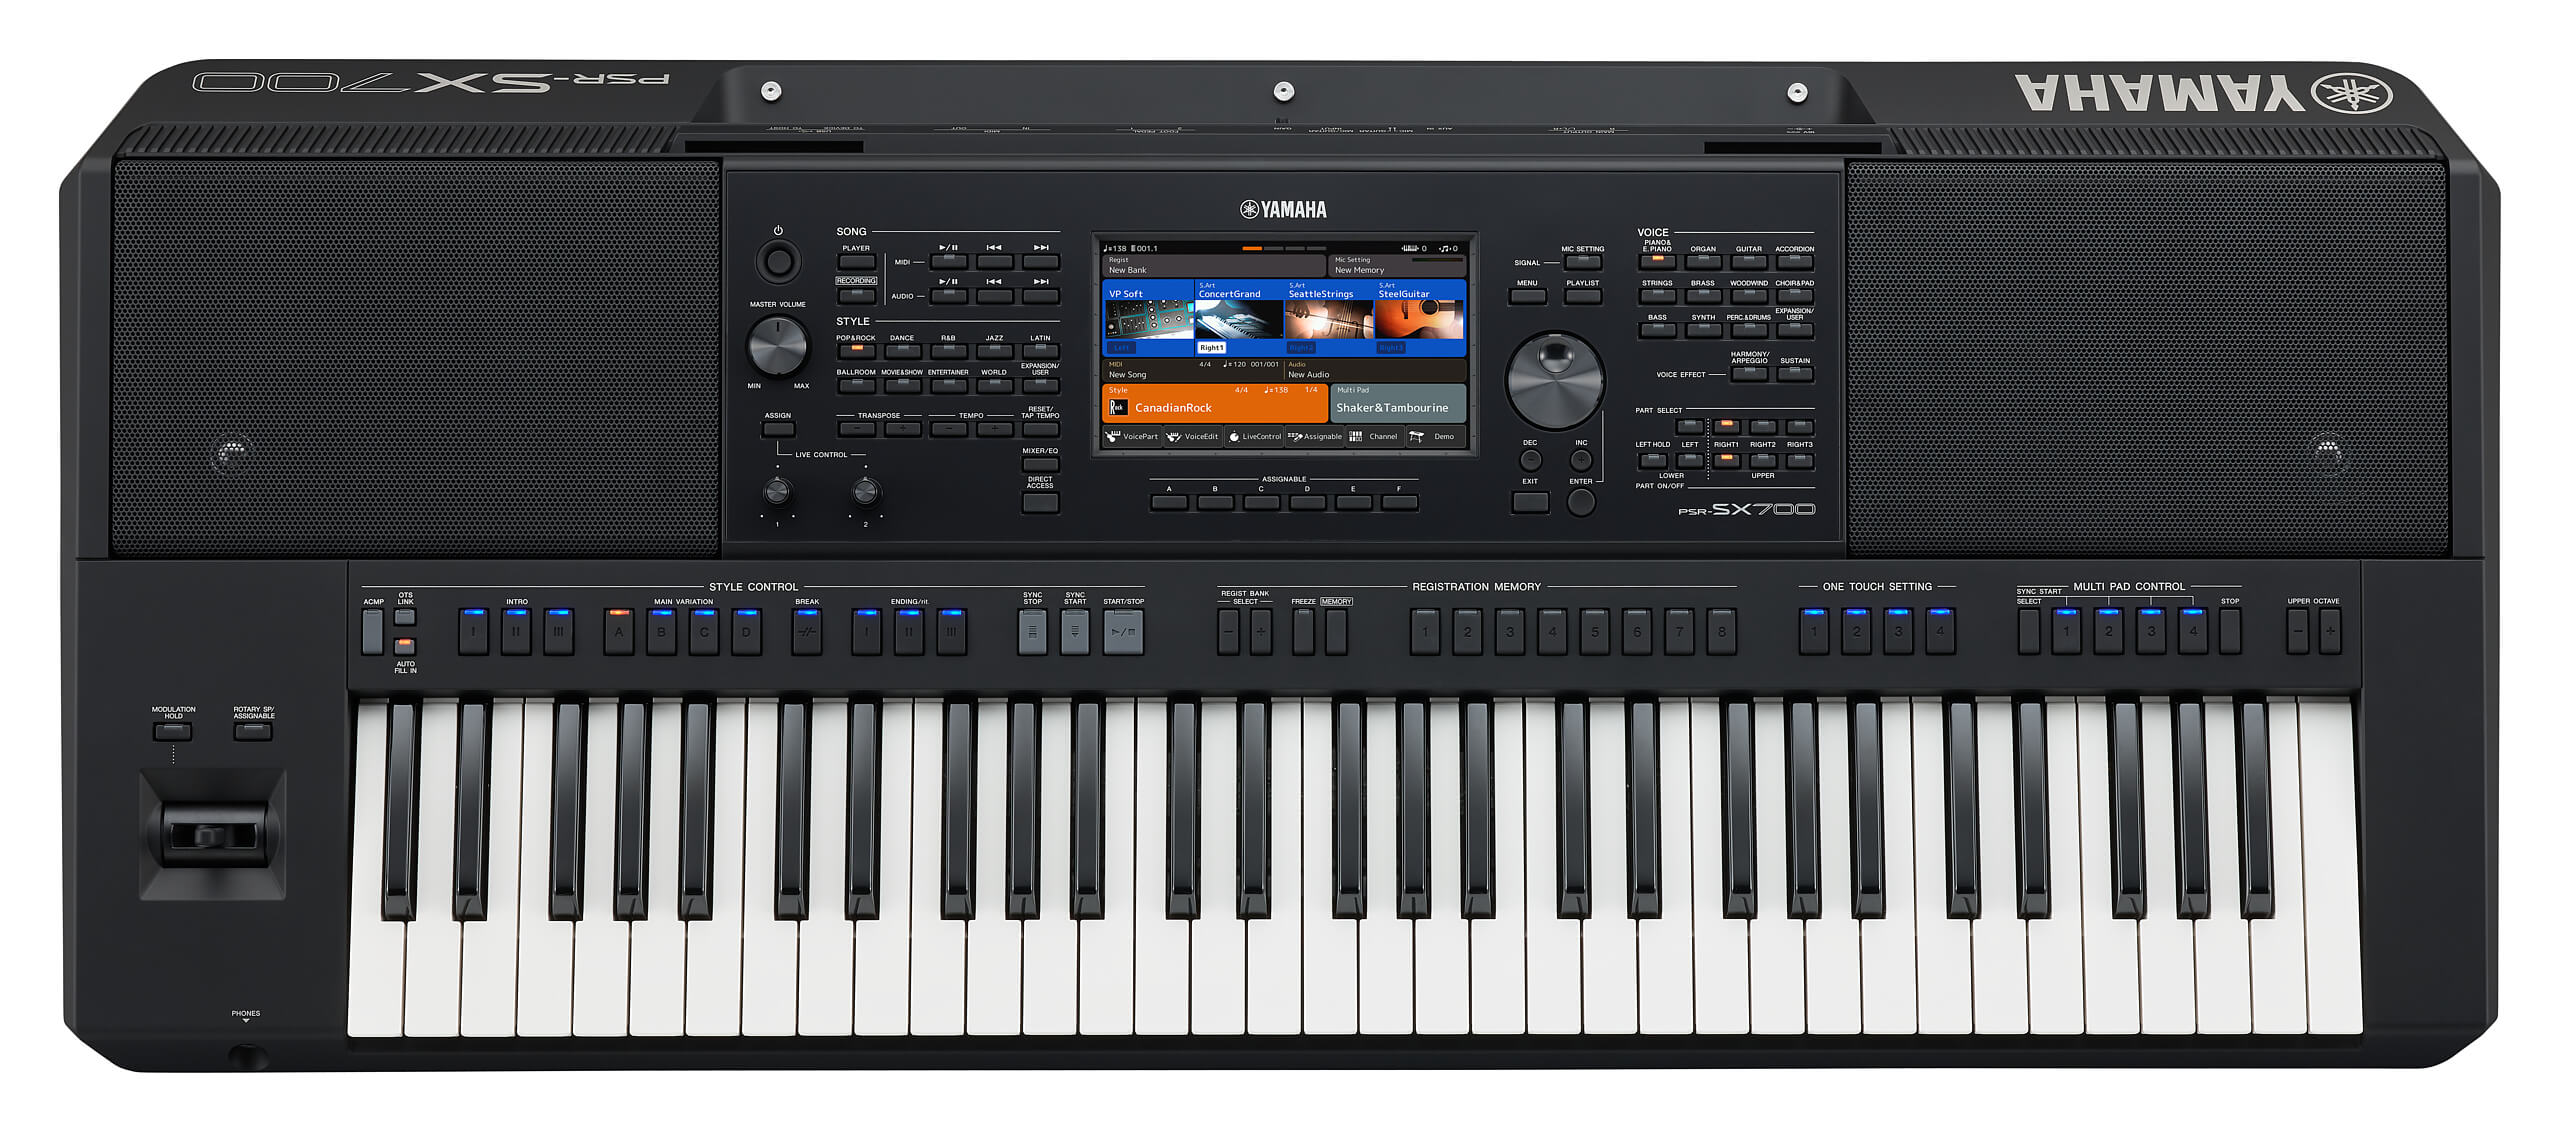 Teclado Semi-Profesional Yamaha PSR-SX700